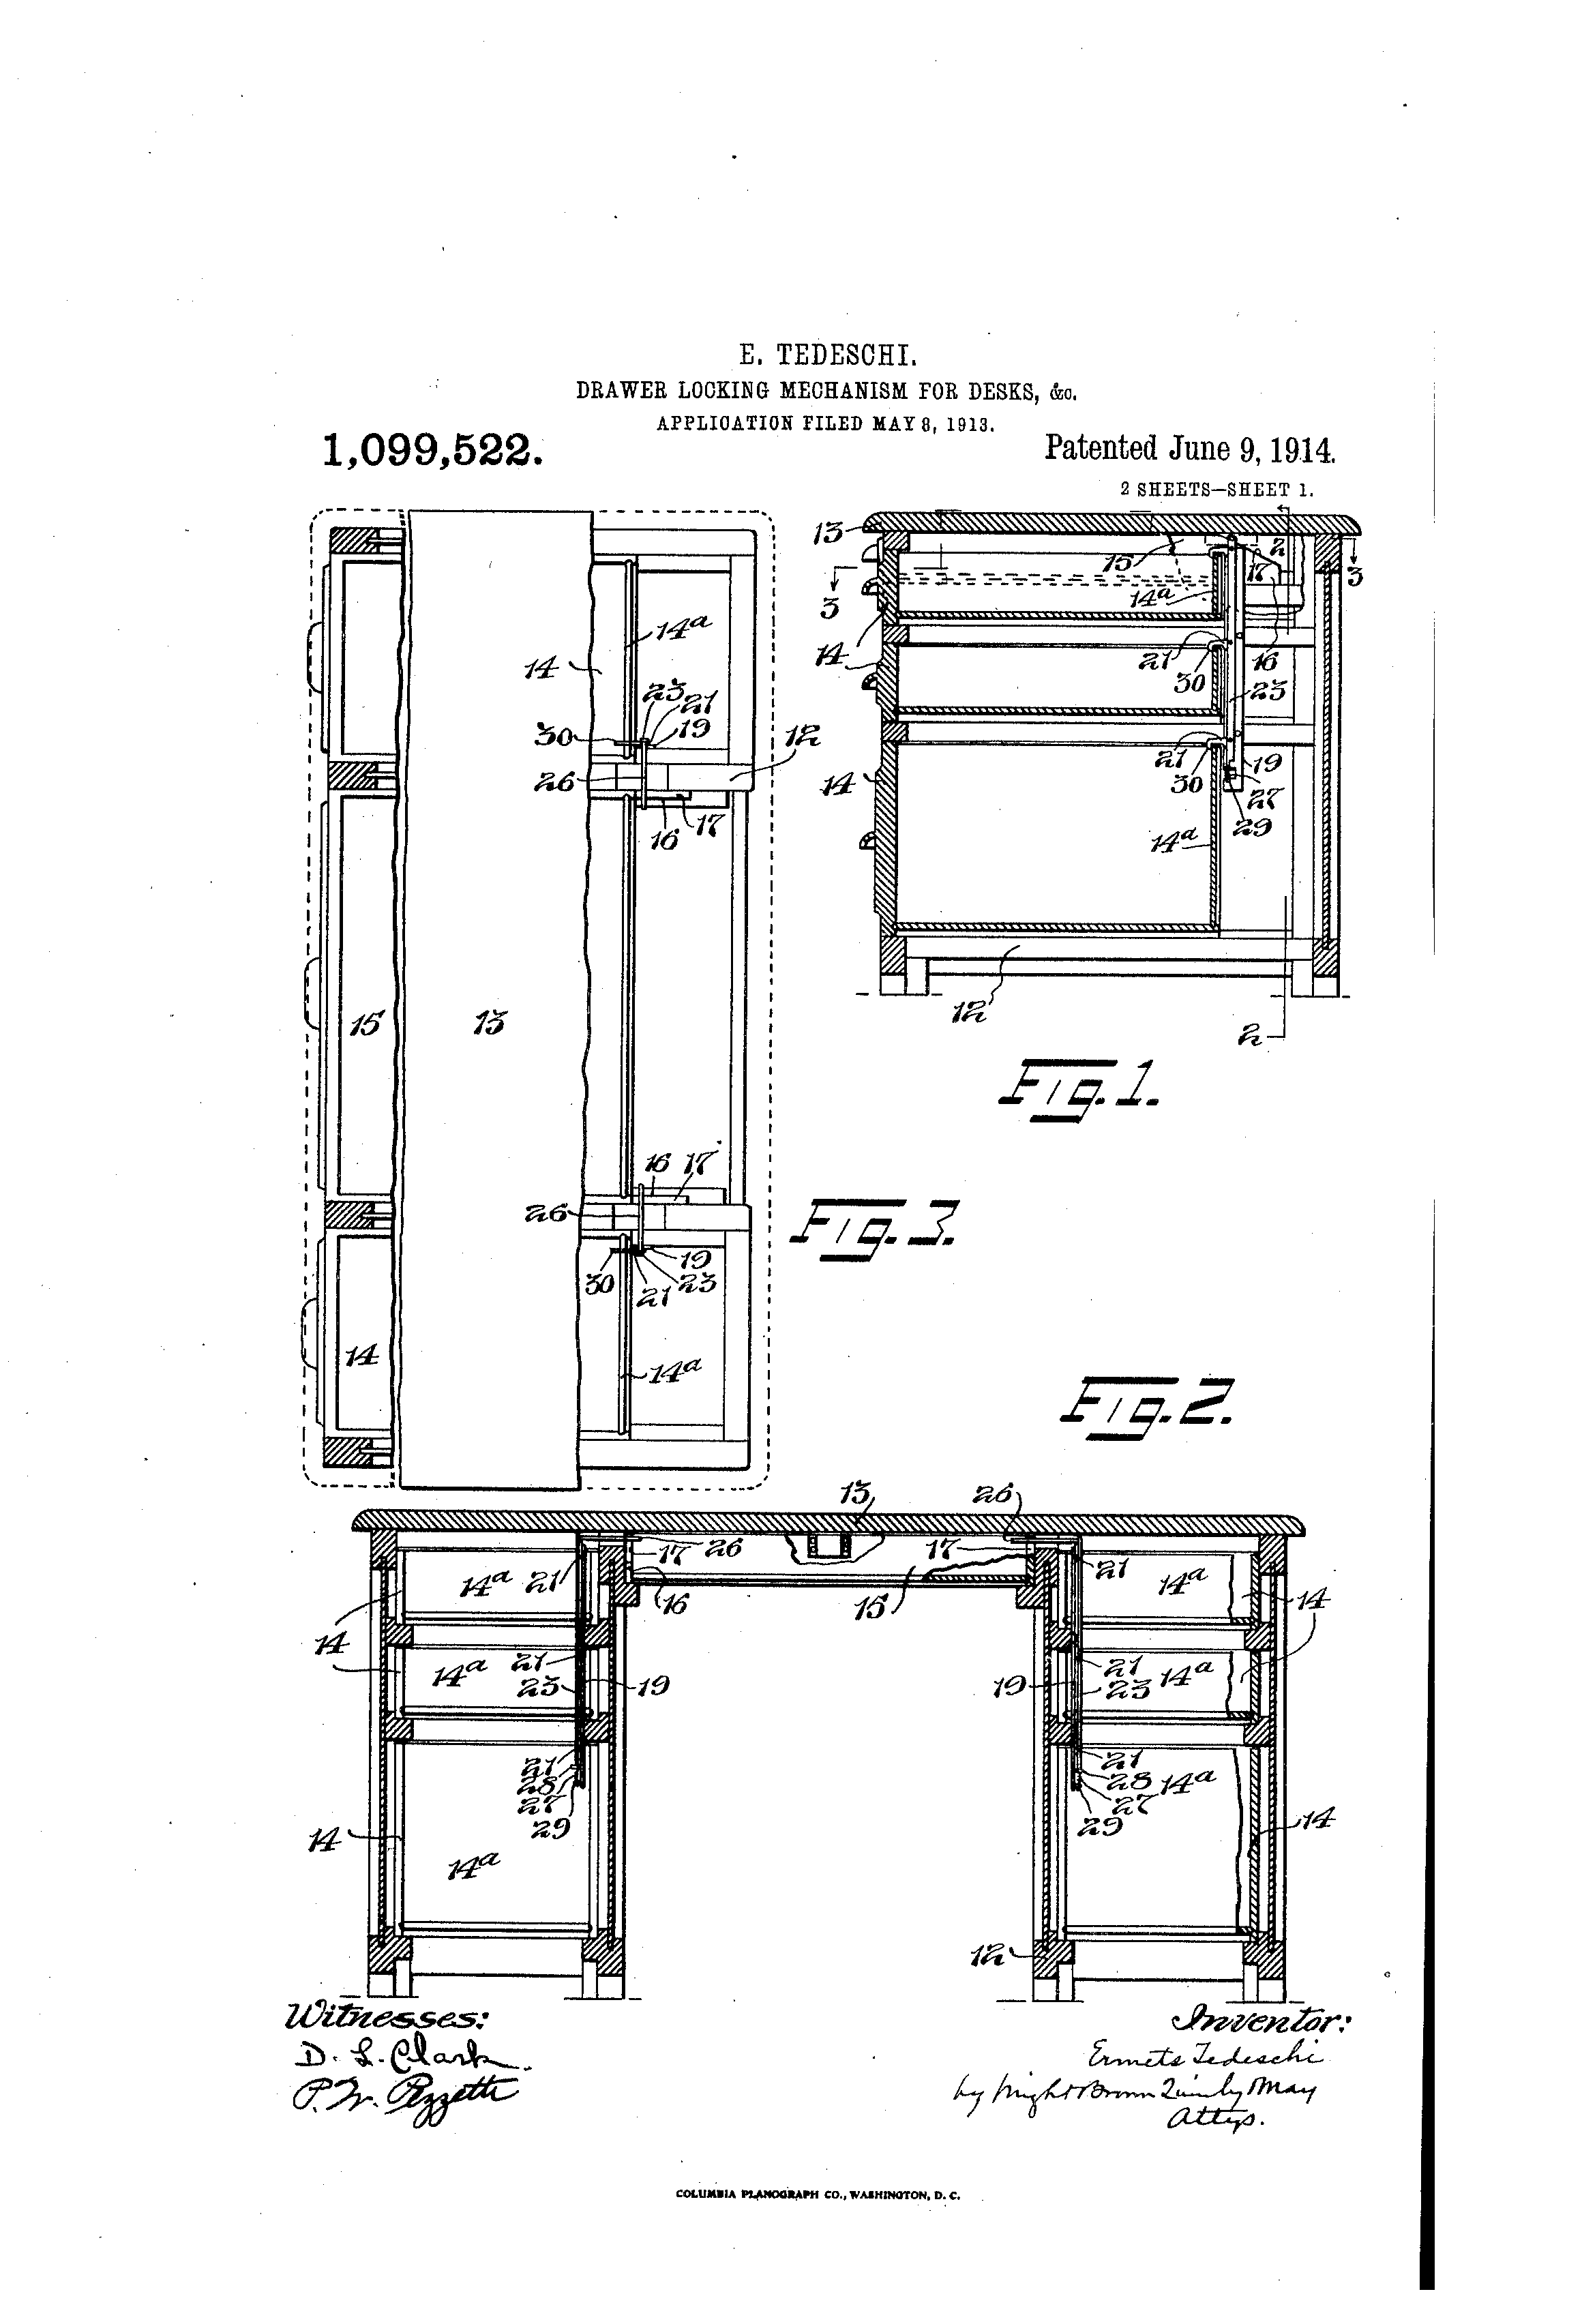 Patent Us1099522 Drawer Locking Mechanism For Desks Amp C